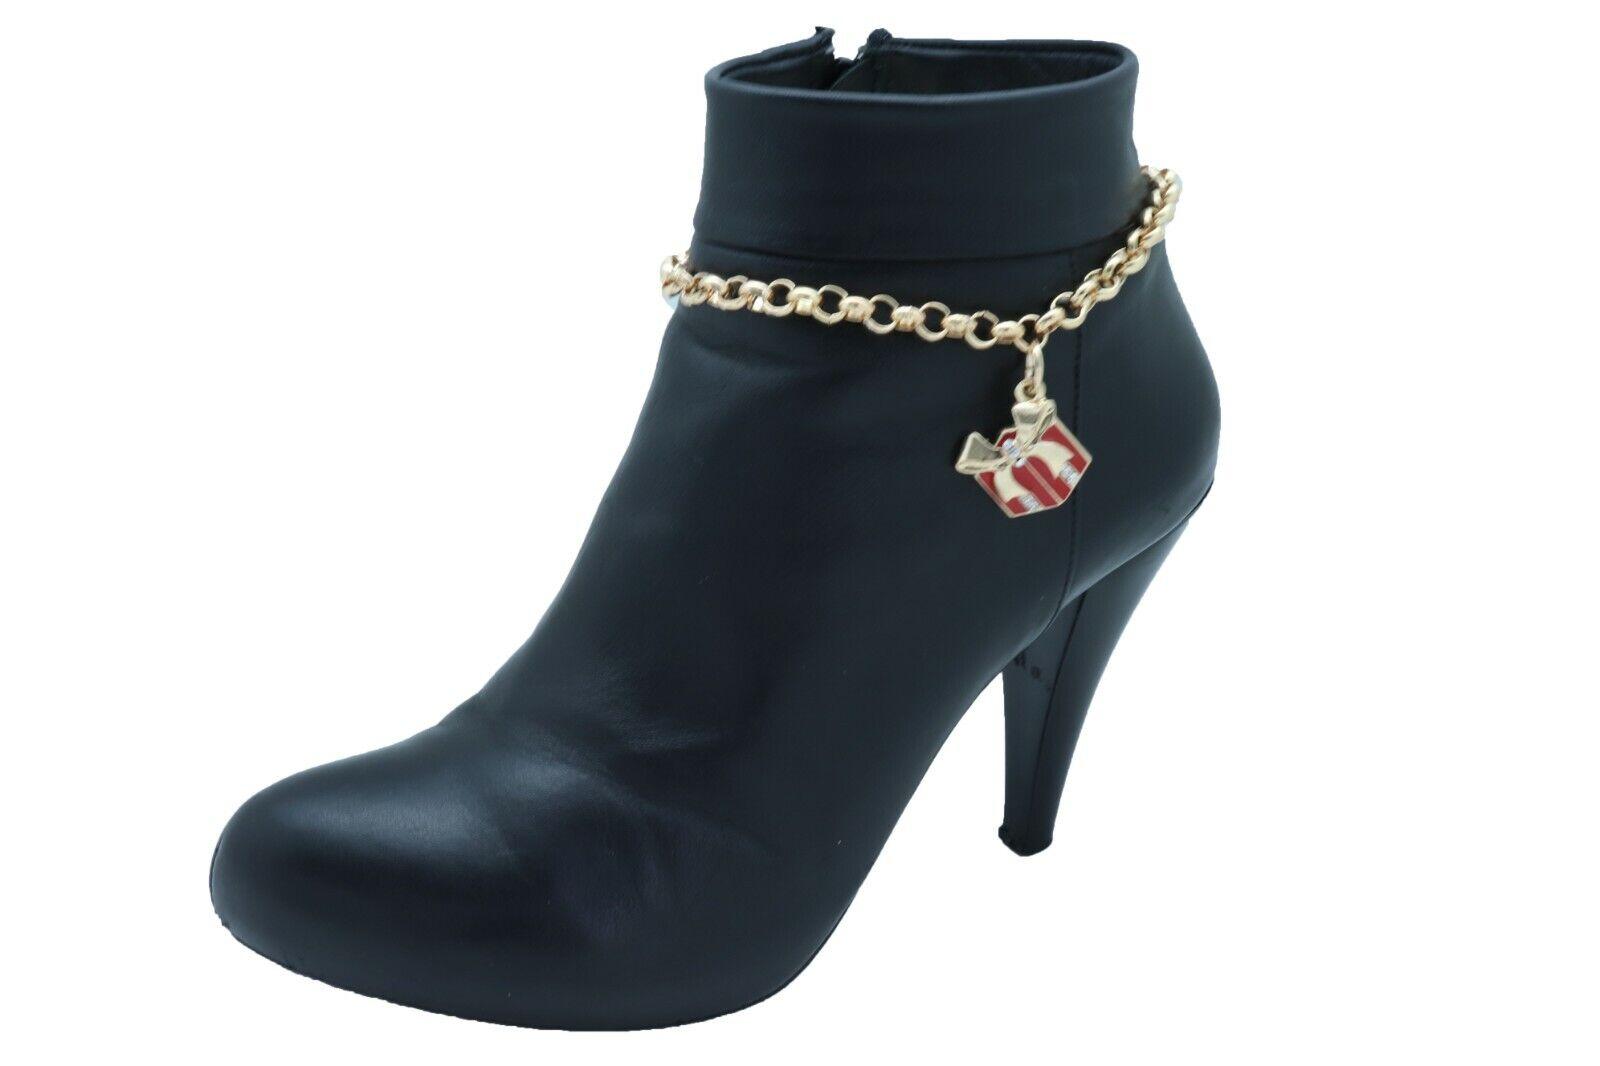 New Women Gold Metal Chain Boot Bracelet Shoe Fun Red Gift Present Charm Playful